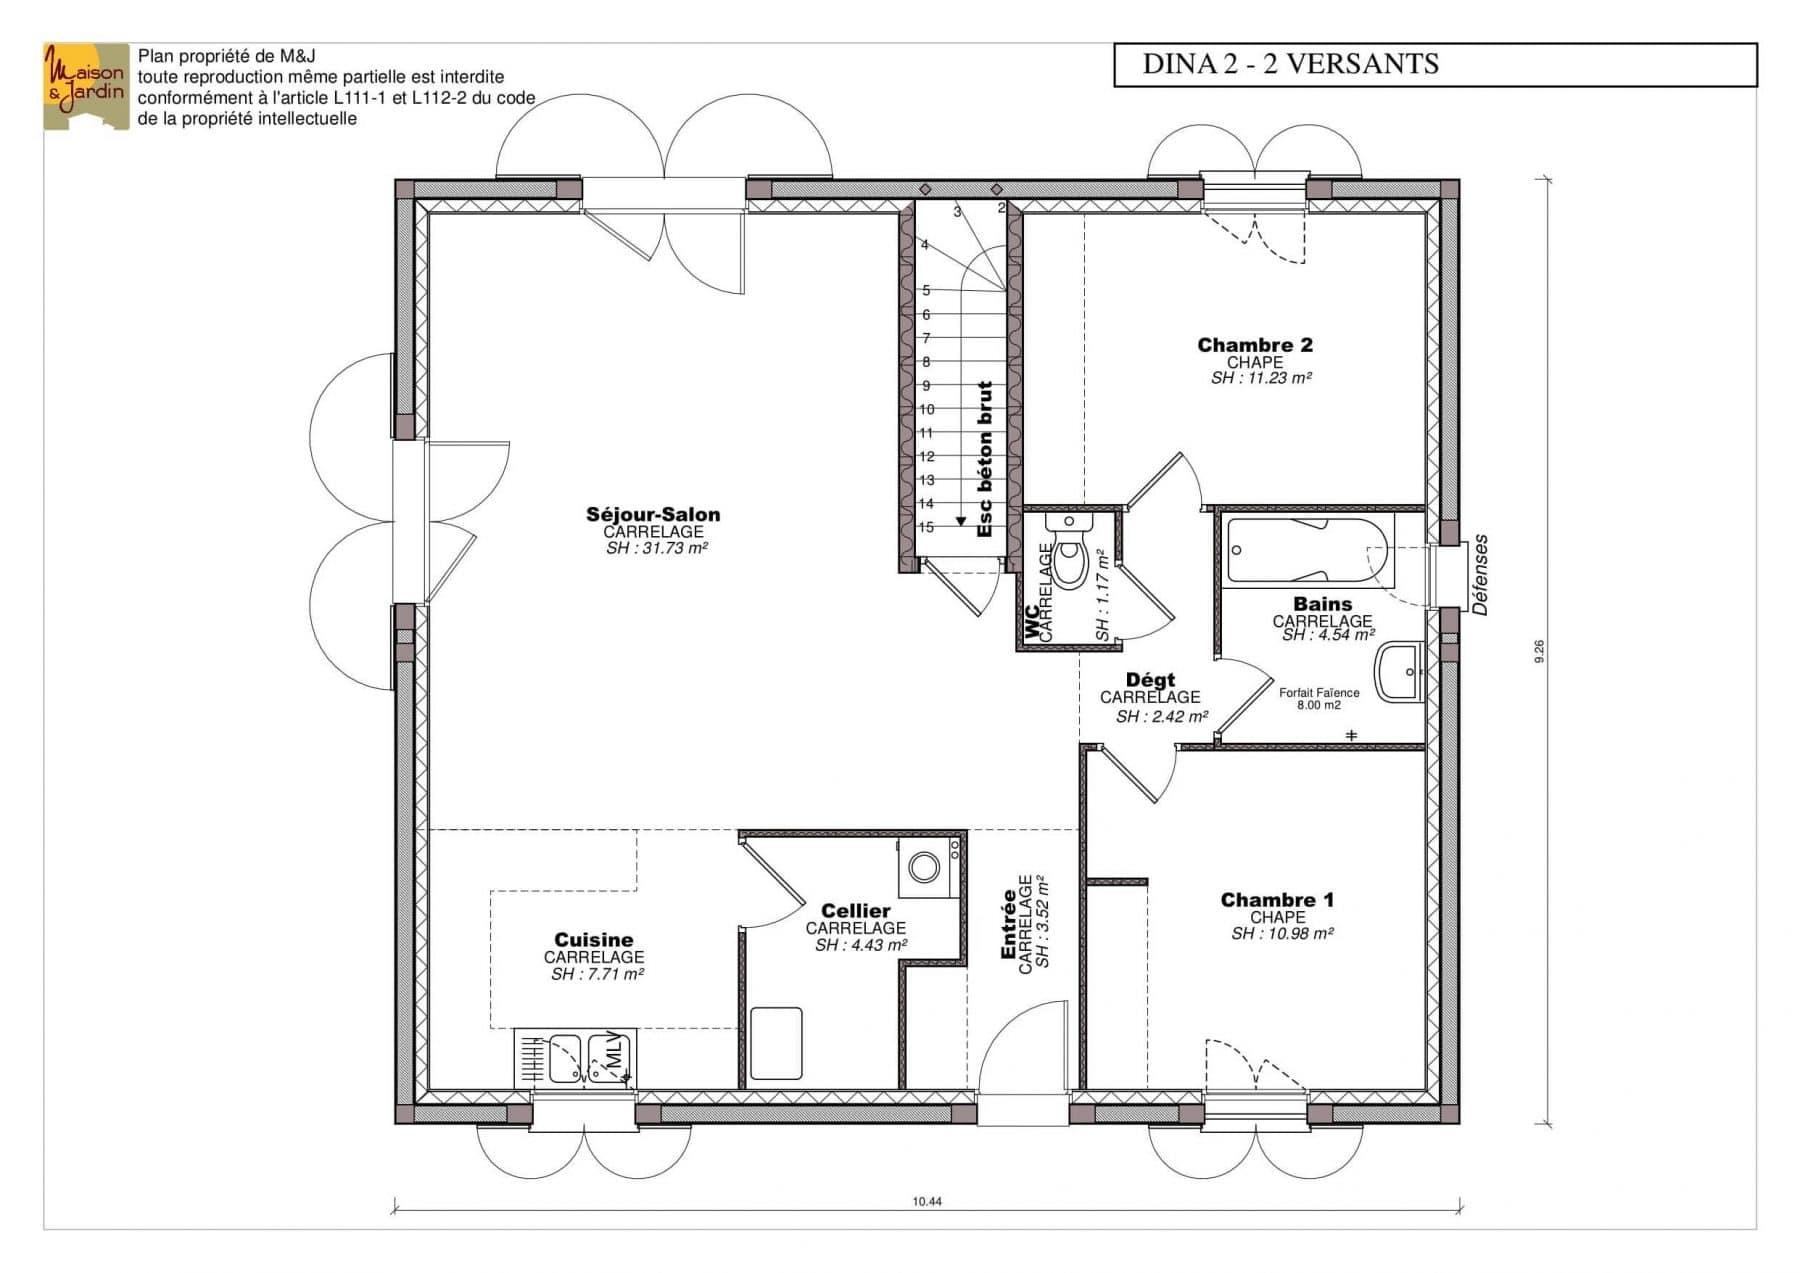 plan maison Dina78rdc sans cote